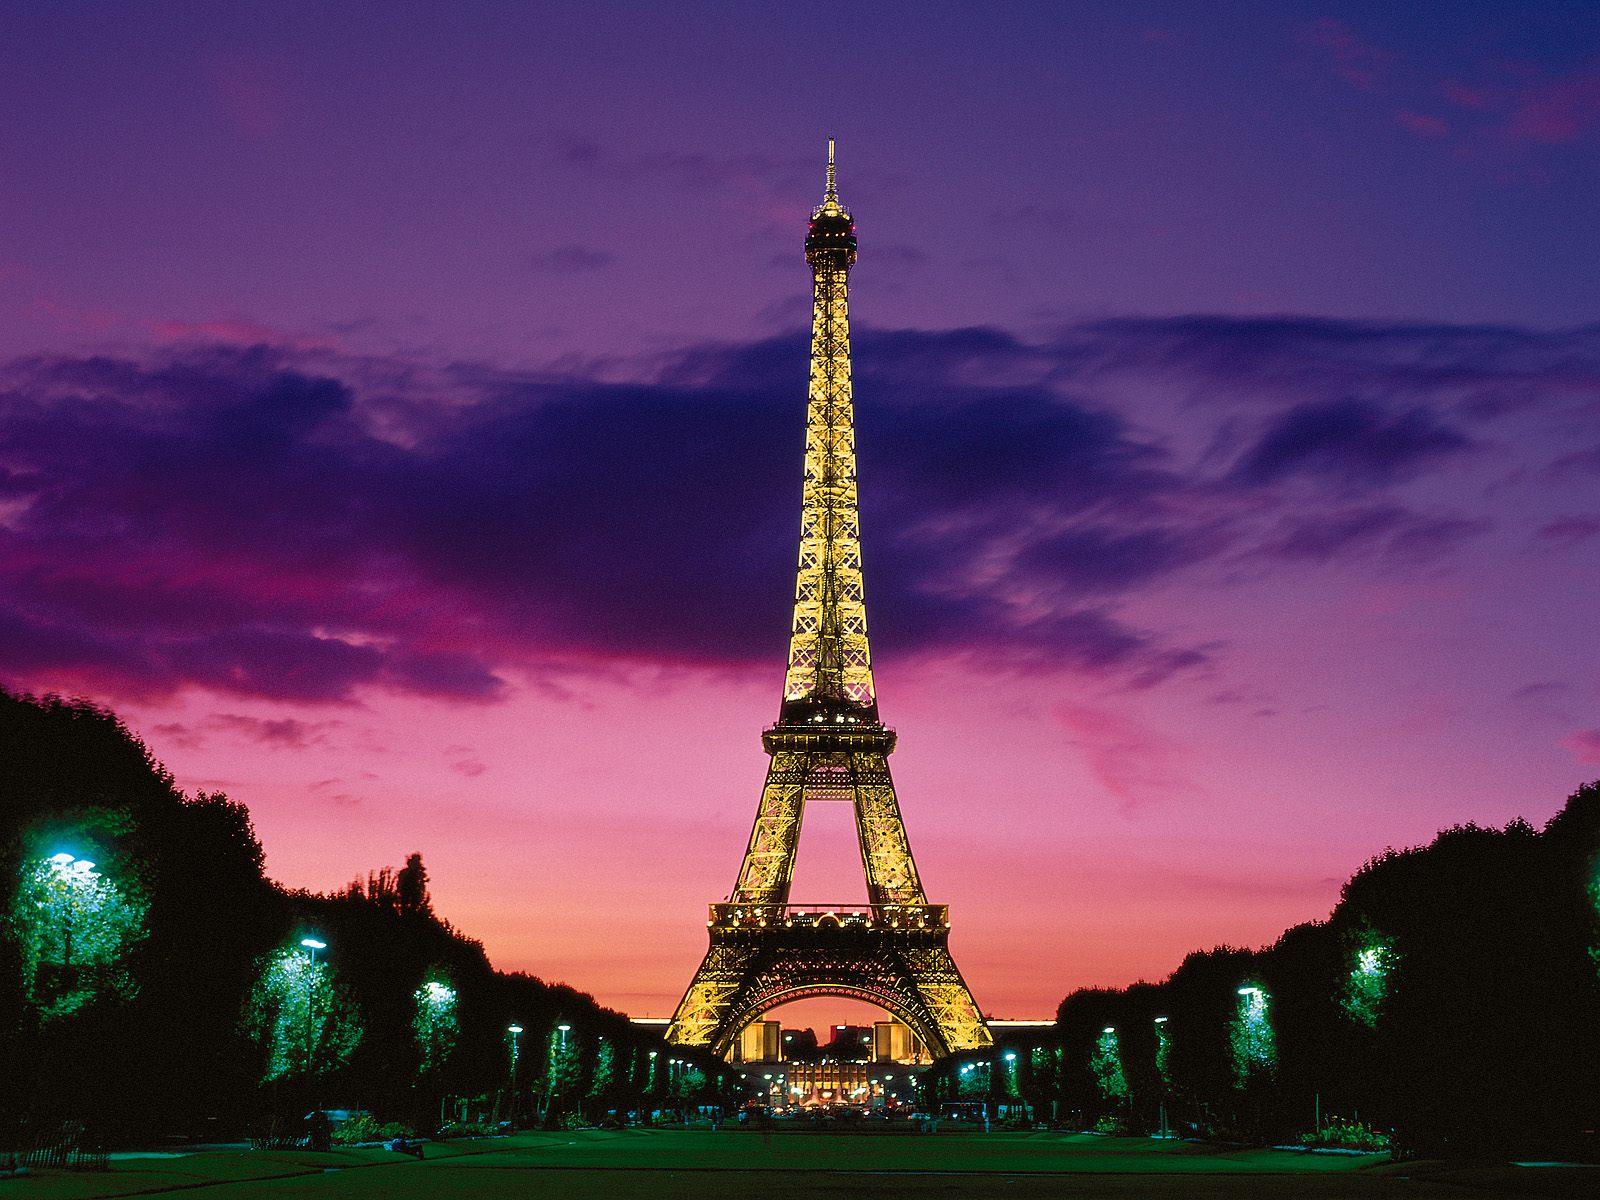 http://2.bp.blogspot.com/-cAwpYJeIfDA/UKp2WhQHRTI/AAAAAAAAUvY/w0UzXjY26IY/s1600/Paris.jpg